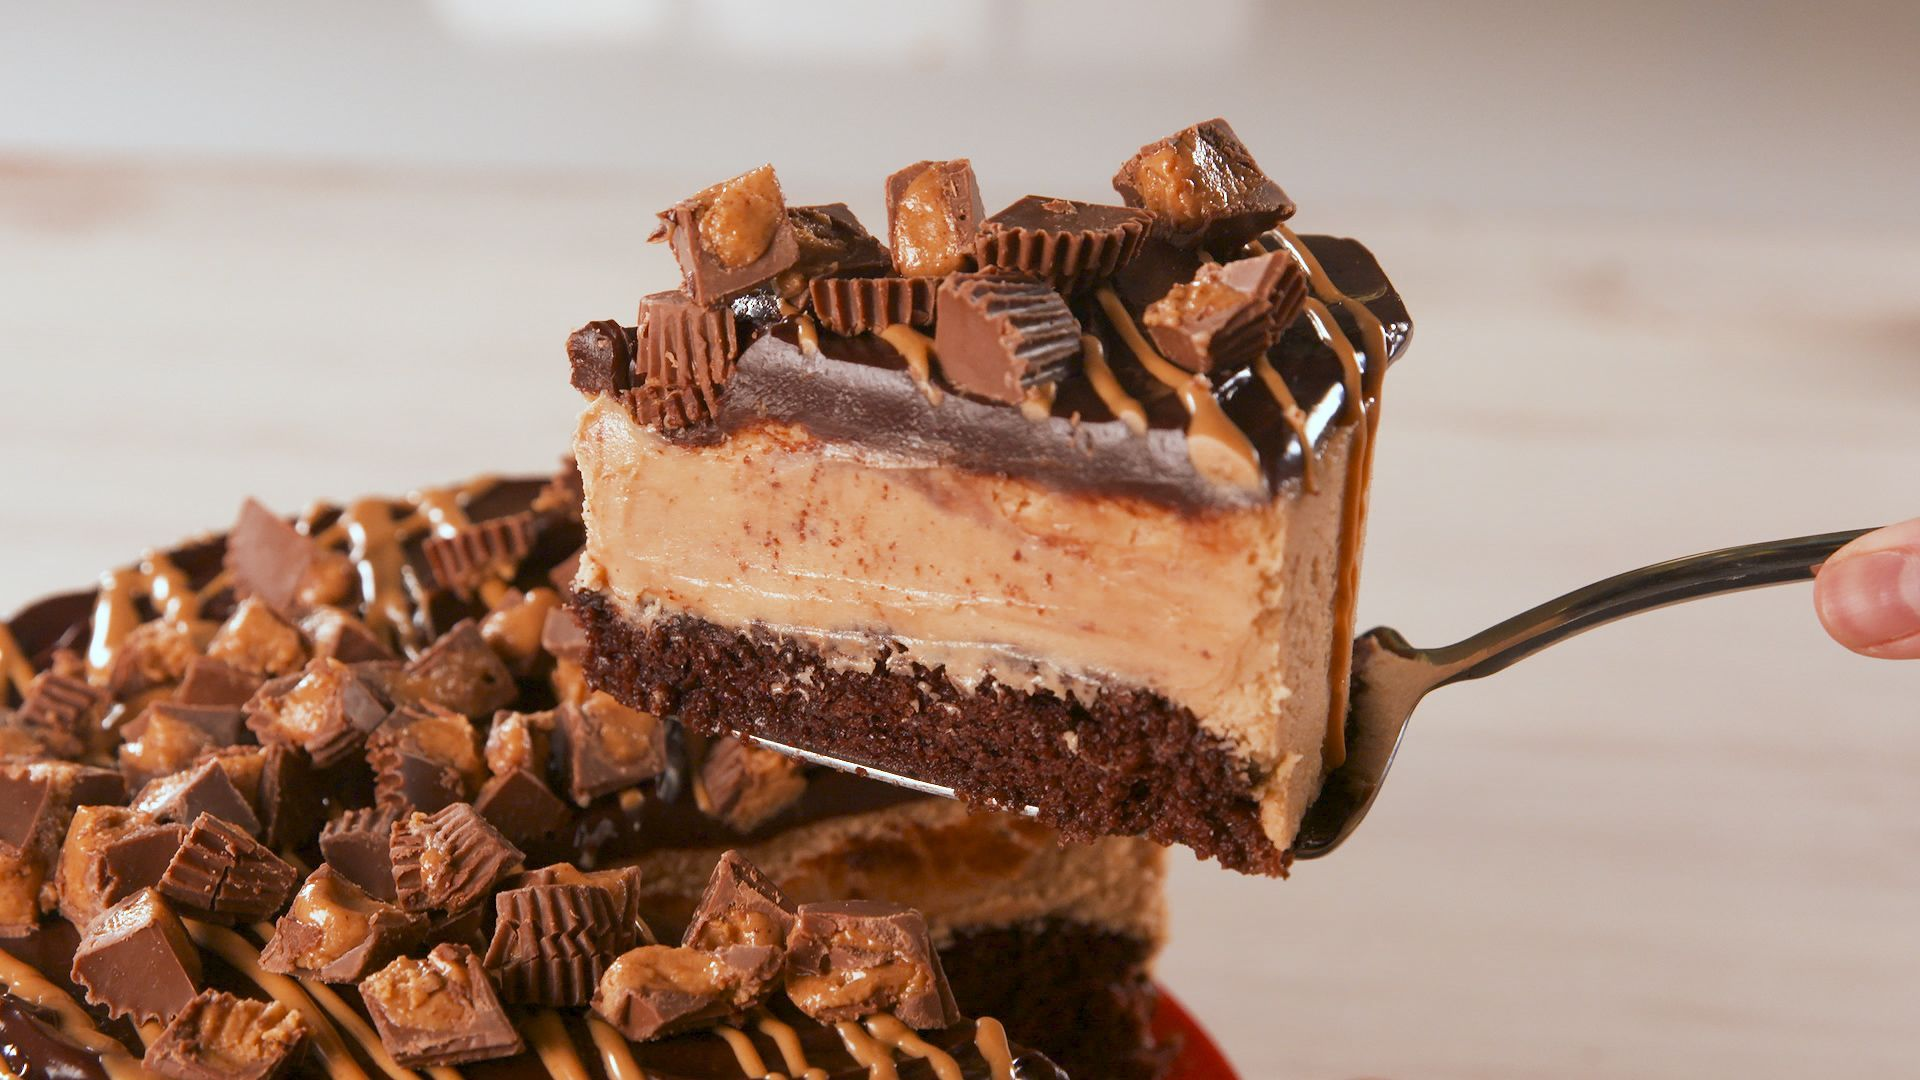 Best Chocolate Peanut Butter Cheesecake Recipe Chocolate Peanut Butter Cheesecake